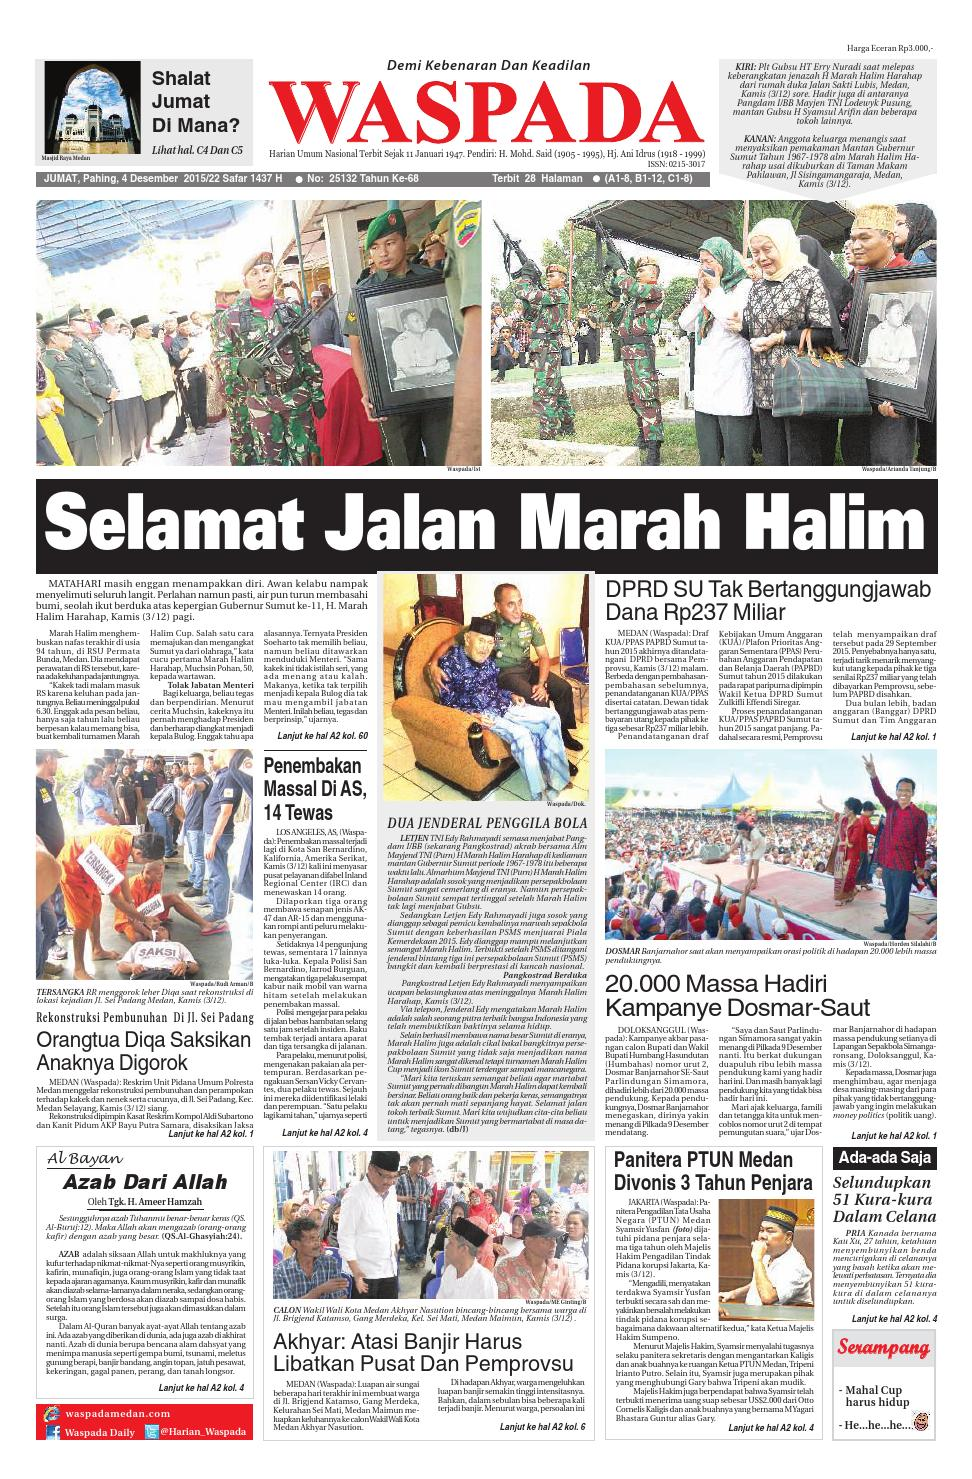 Waspadajumat 4 Desember 2015 By Harian Waspada Issuu Produk Umkm Bumn Bolu Gulung Hj Enong